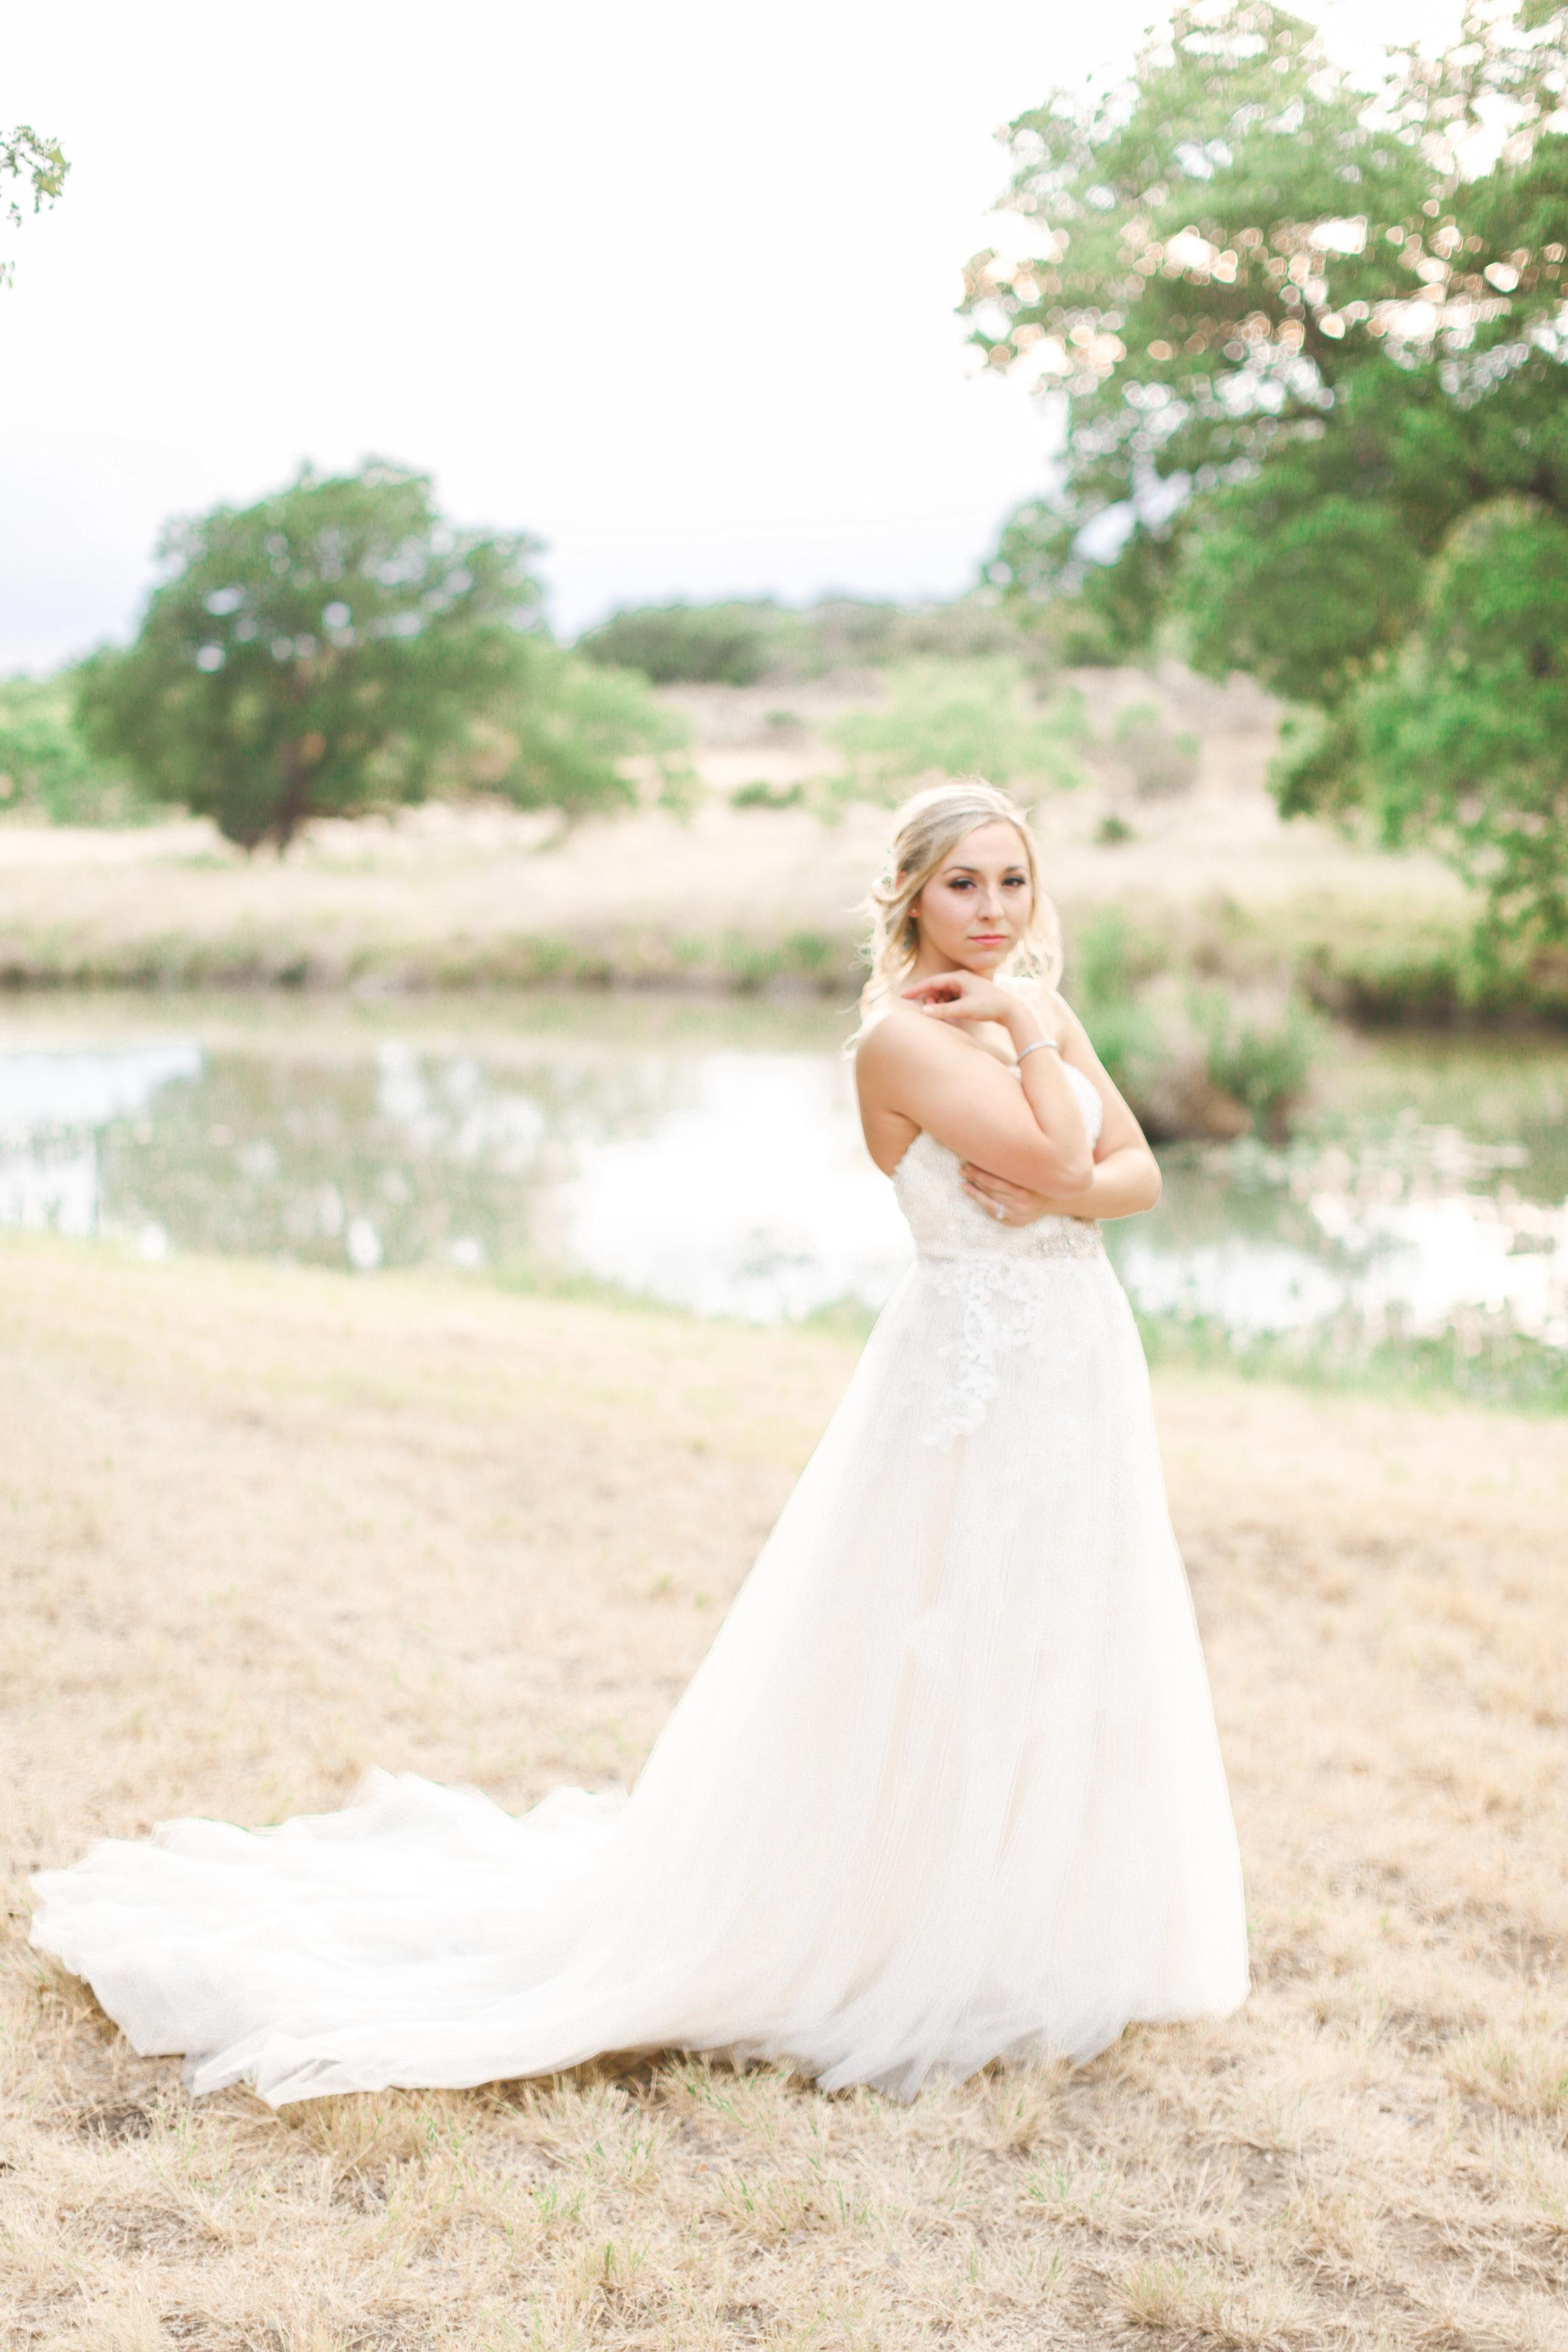 Lewis Wedding Collection - Shara Jo Photography-188.jpg